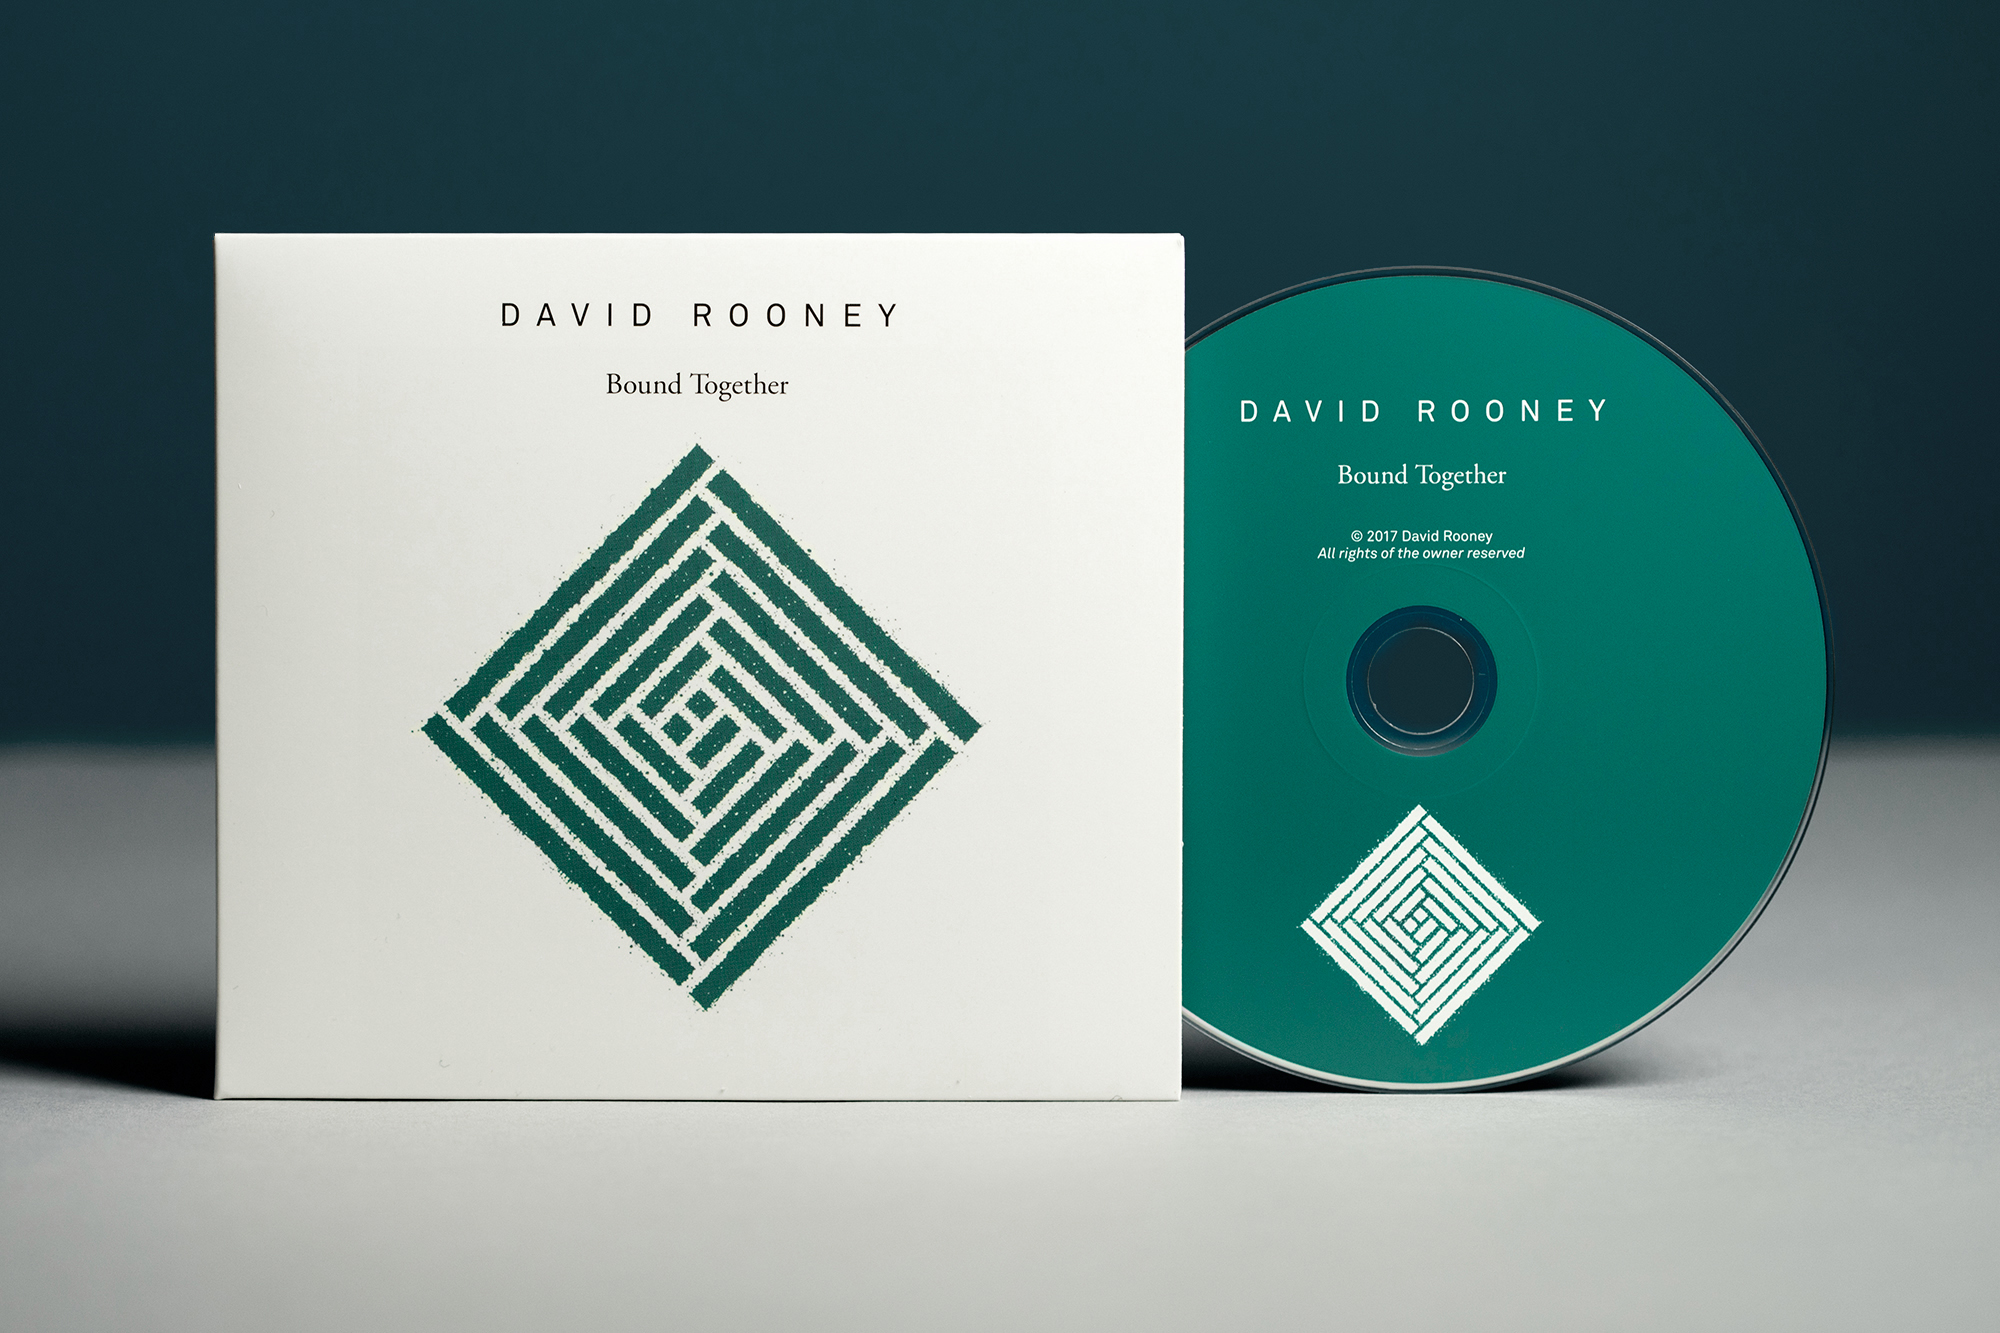 Cover image: David Rooney, 'Bound Together', album on CD.